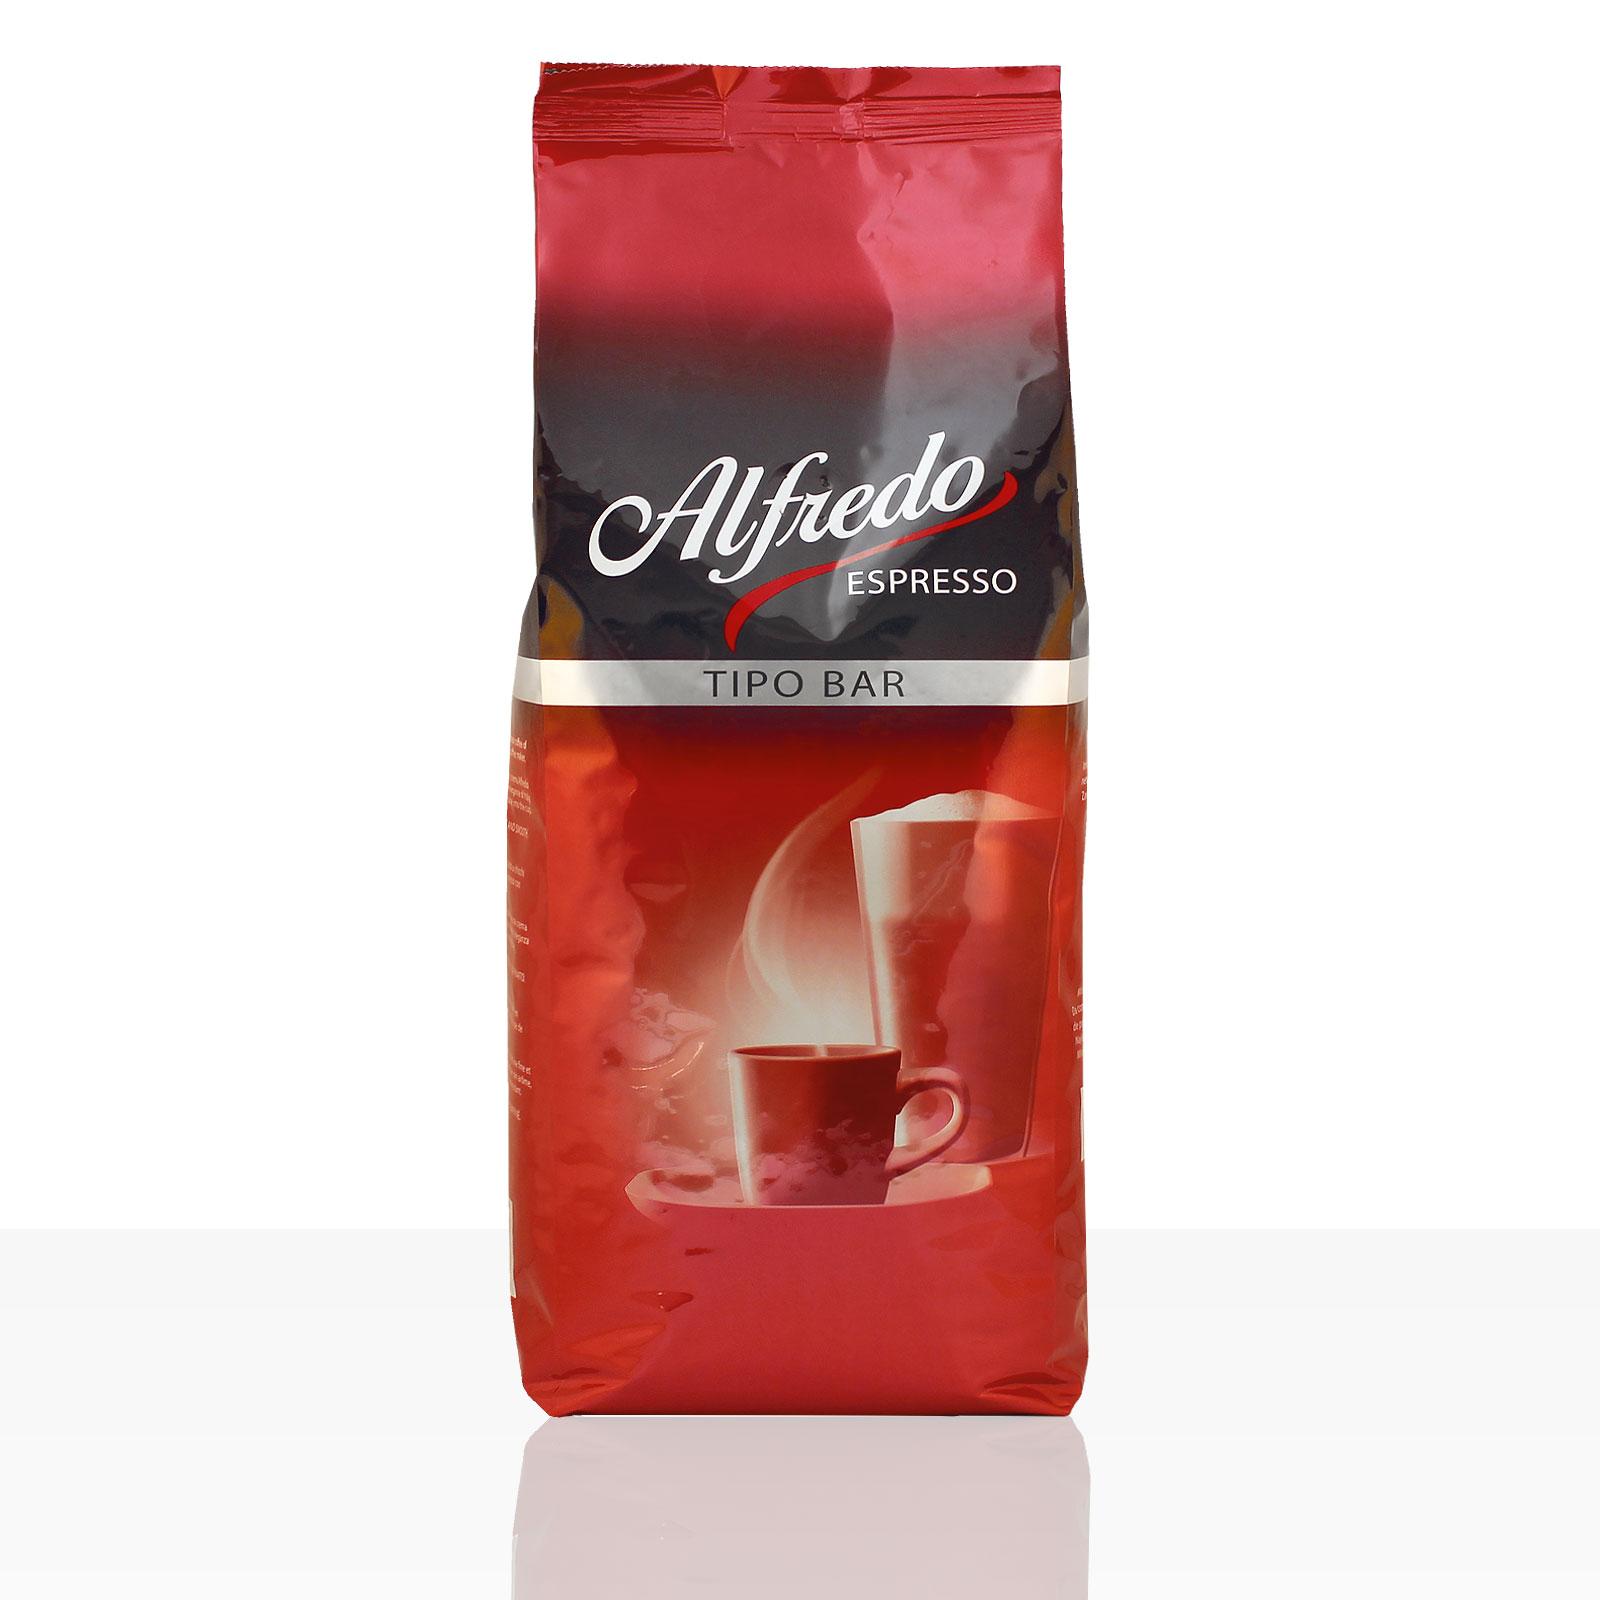 Darboven Alfredo Espresso Tipo-Bar - 6 x 1kg Kaffee-Bohnen